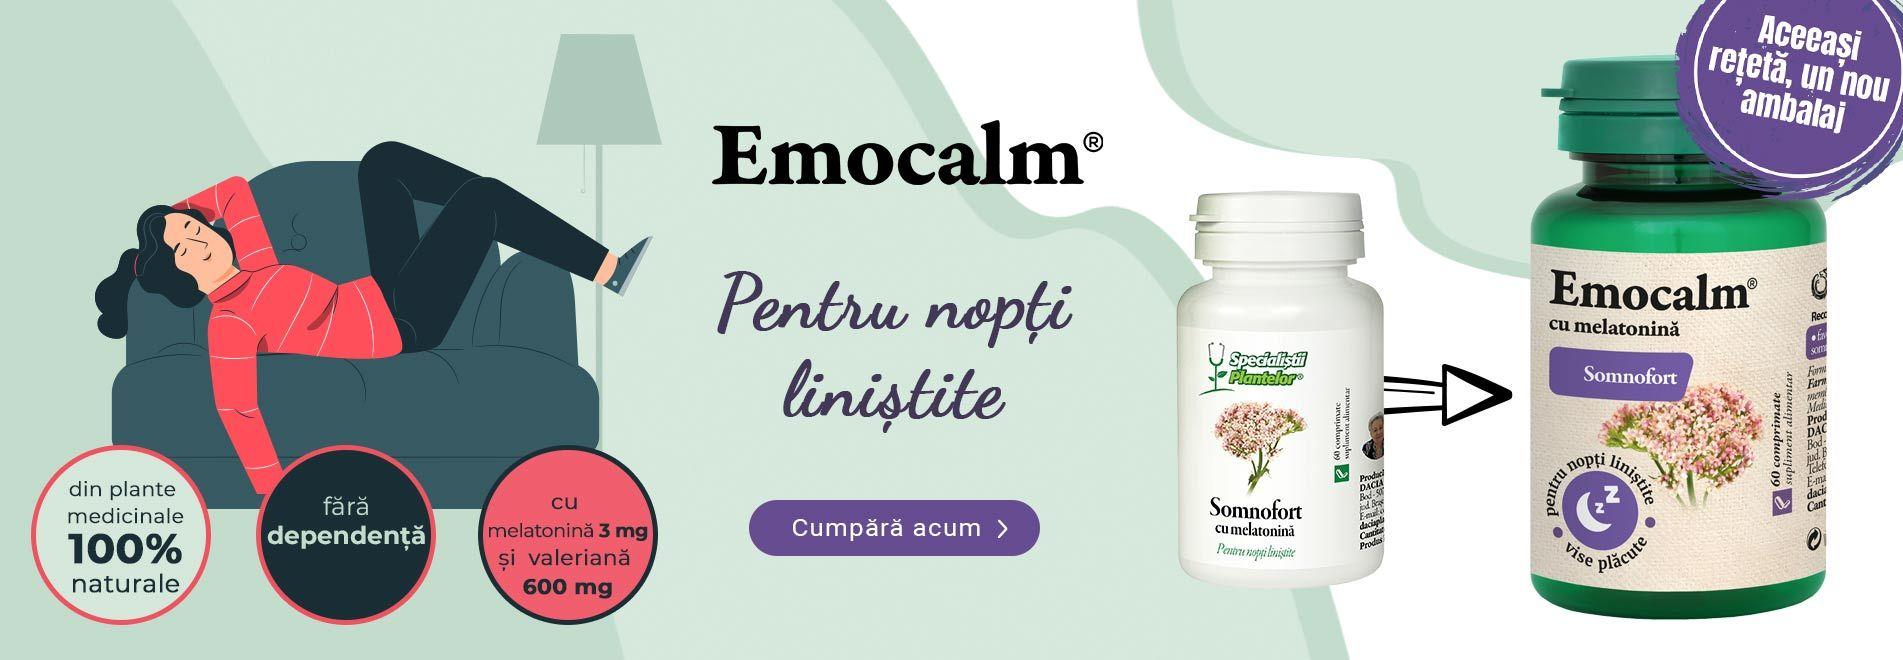 https://www.daciaplant.ro/emocalm-cu-melatonina-60cpr.html